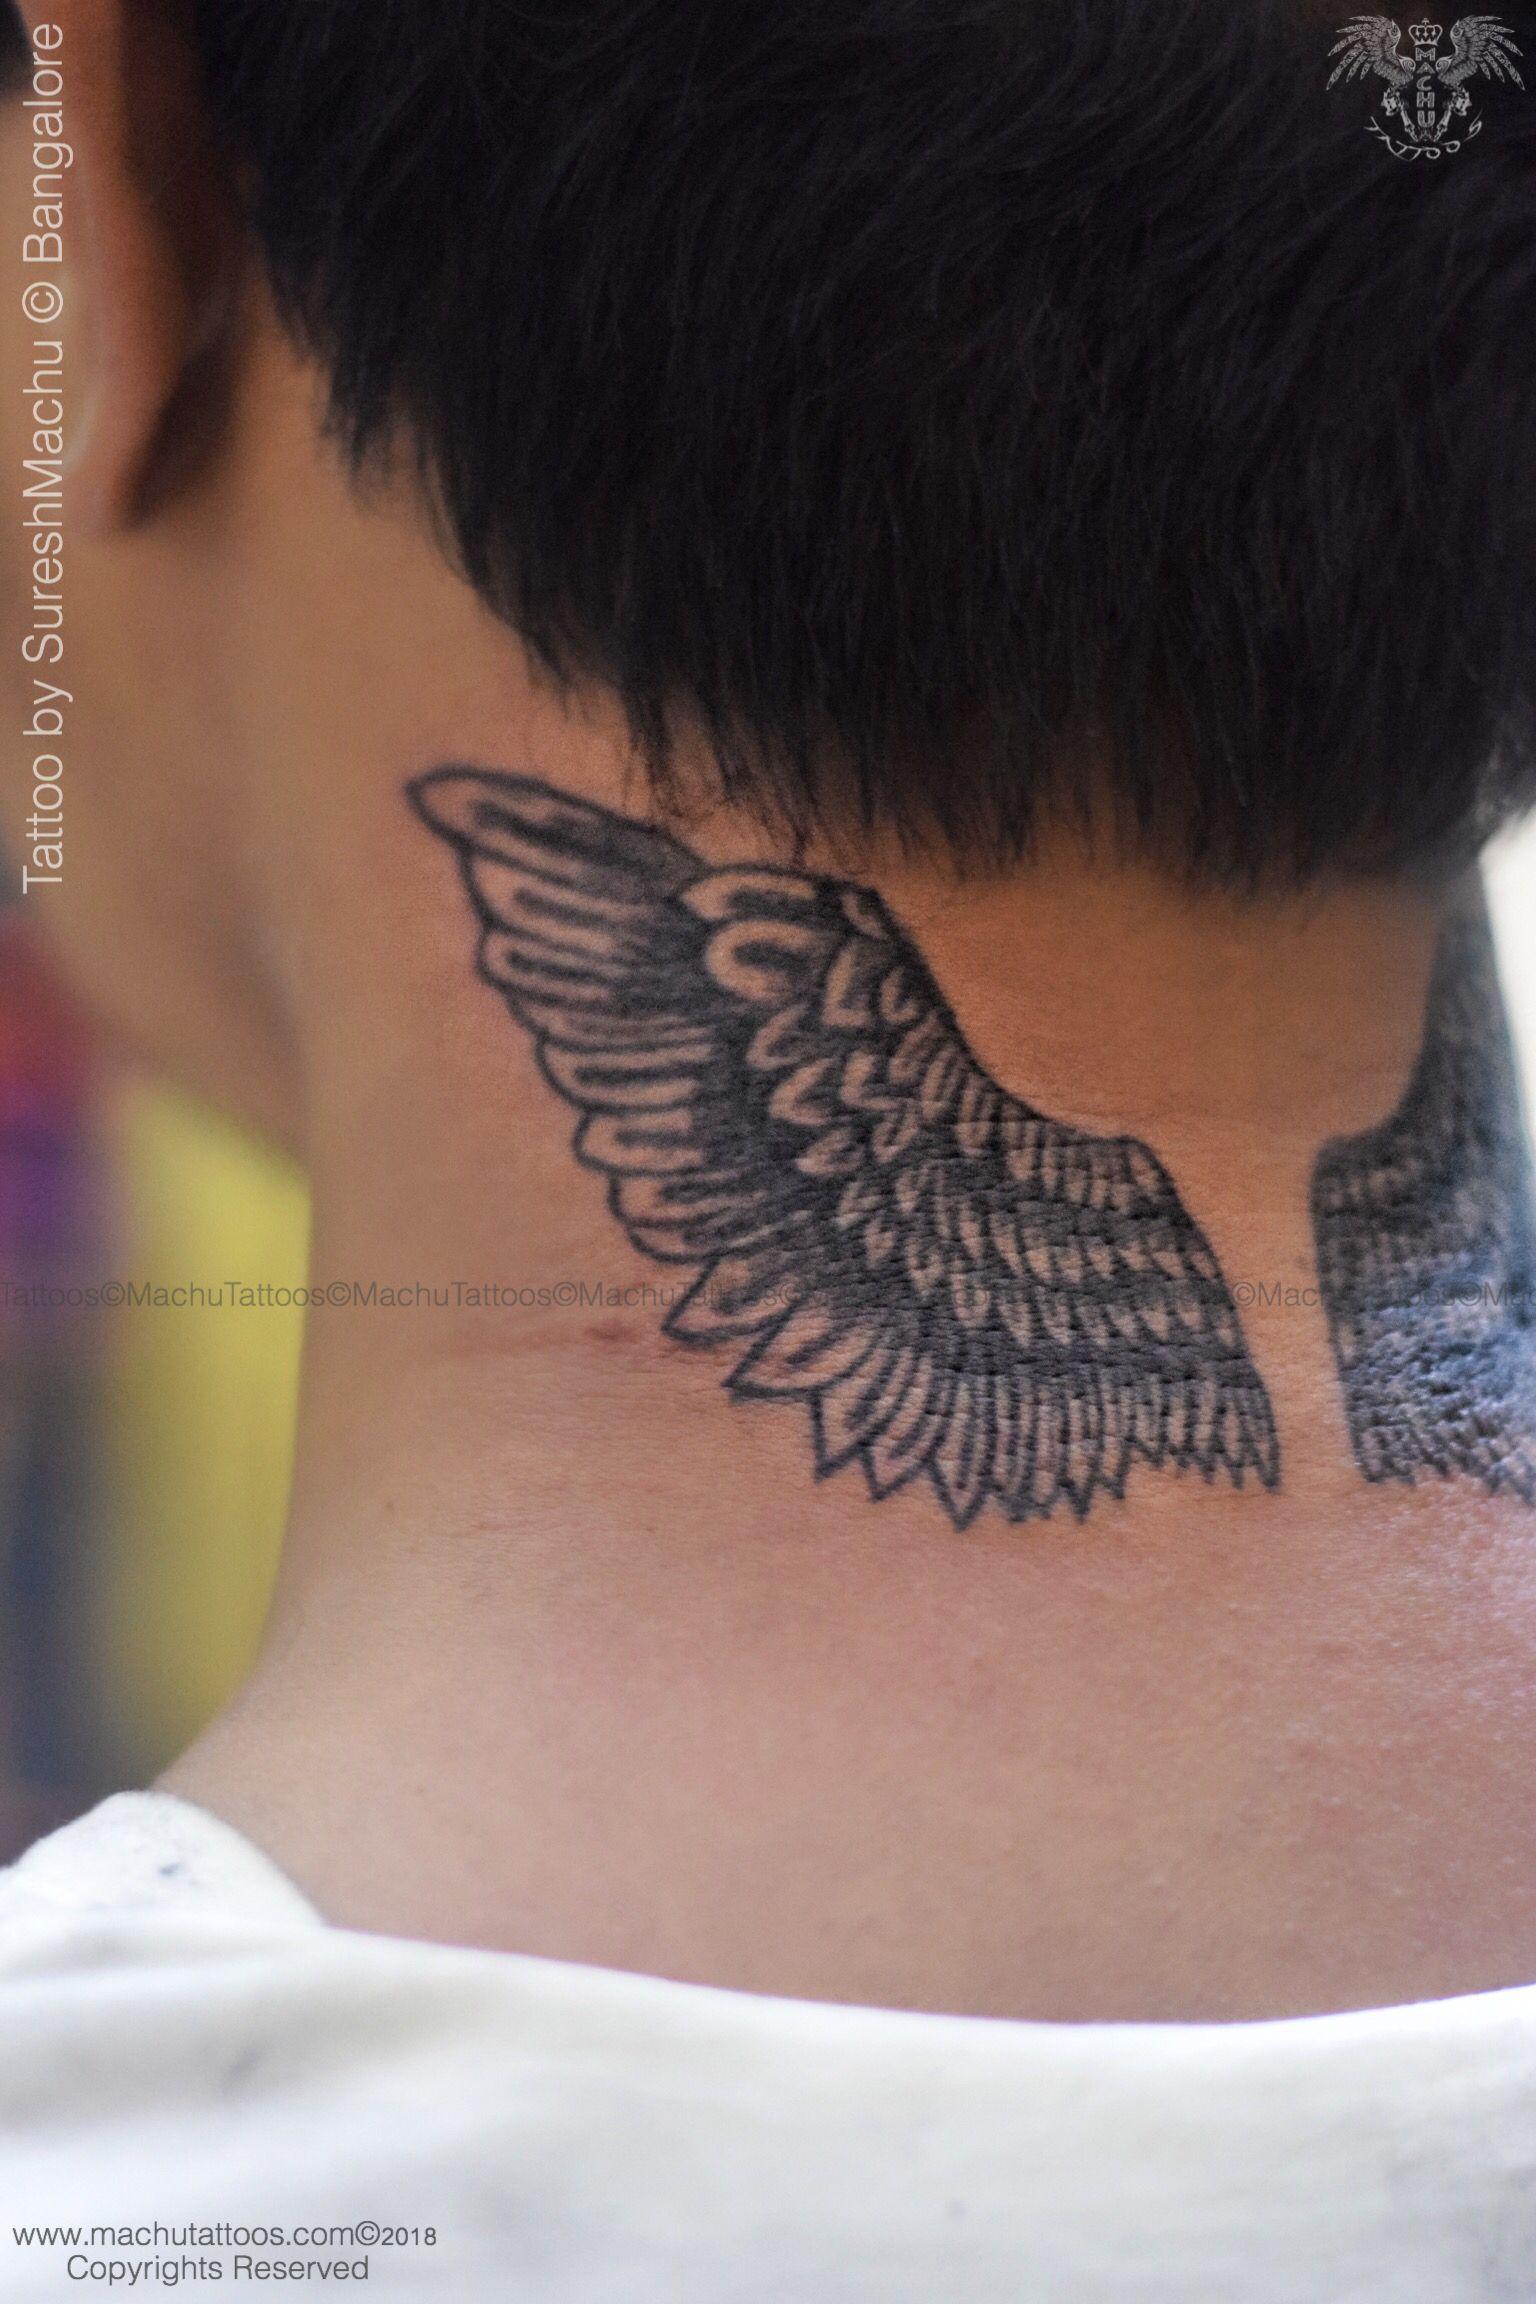 7a8fb4ecbe43b Justin biber back neck wings tattoo done by suresh machu from machu tattoo  studio bangalore india